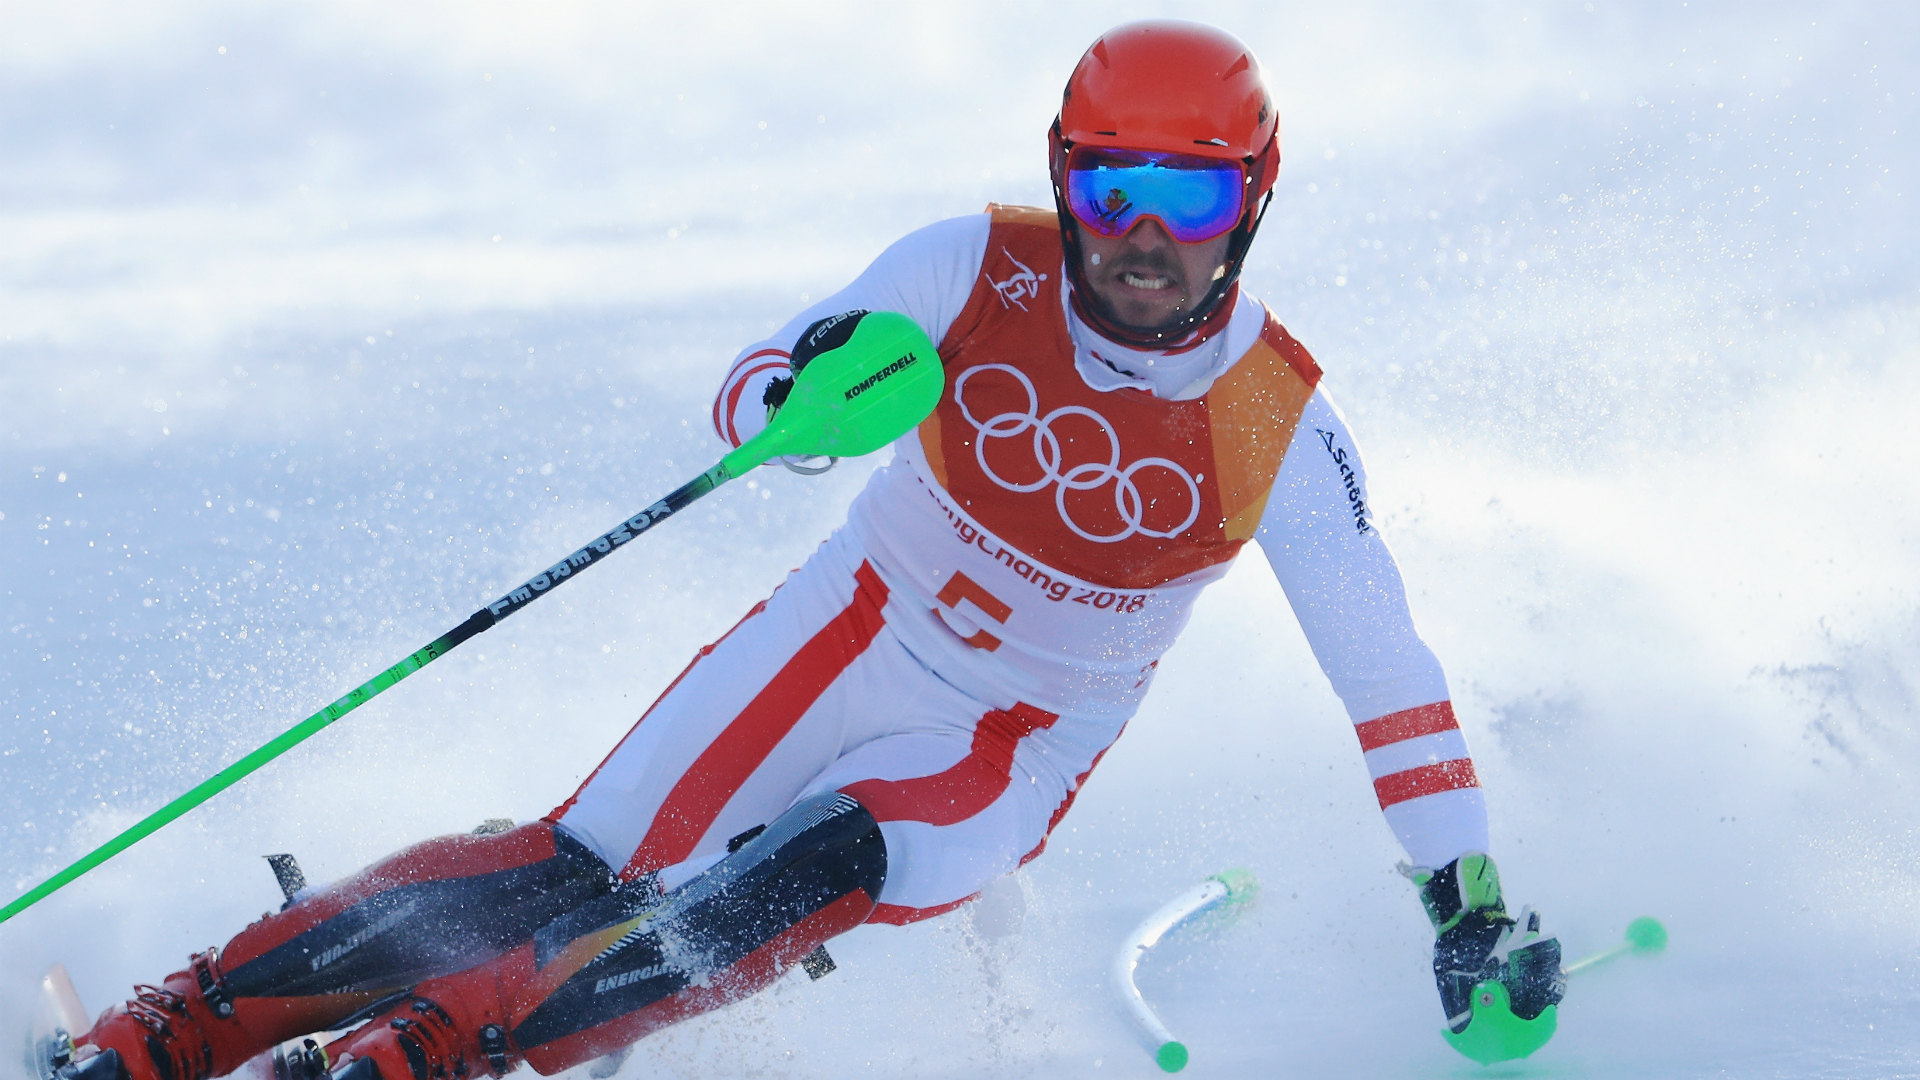 Andre Myhrer wins slalom gold, Marcel Hirscher loses control